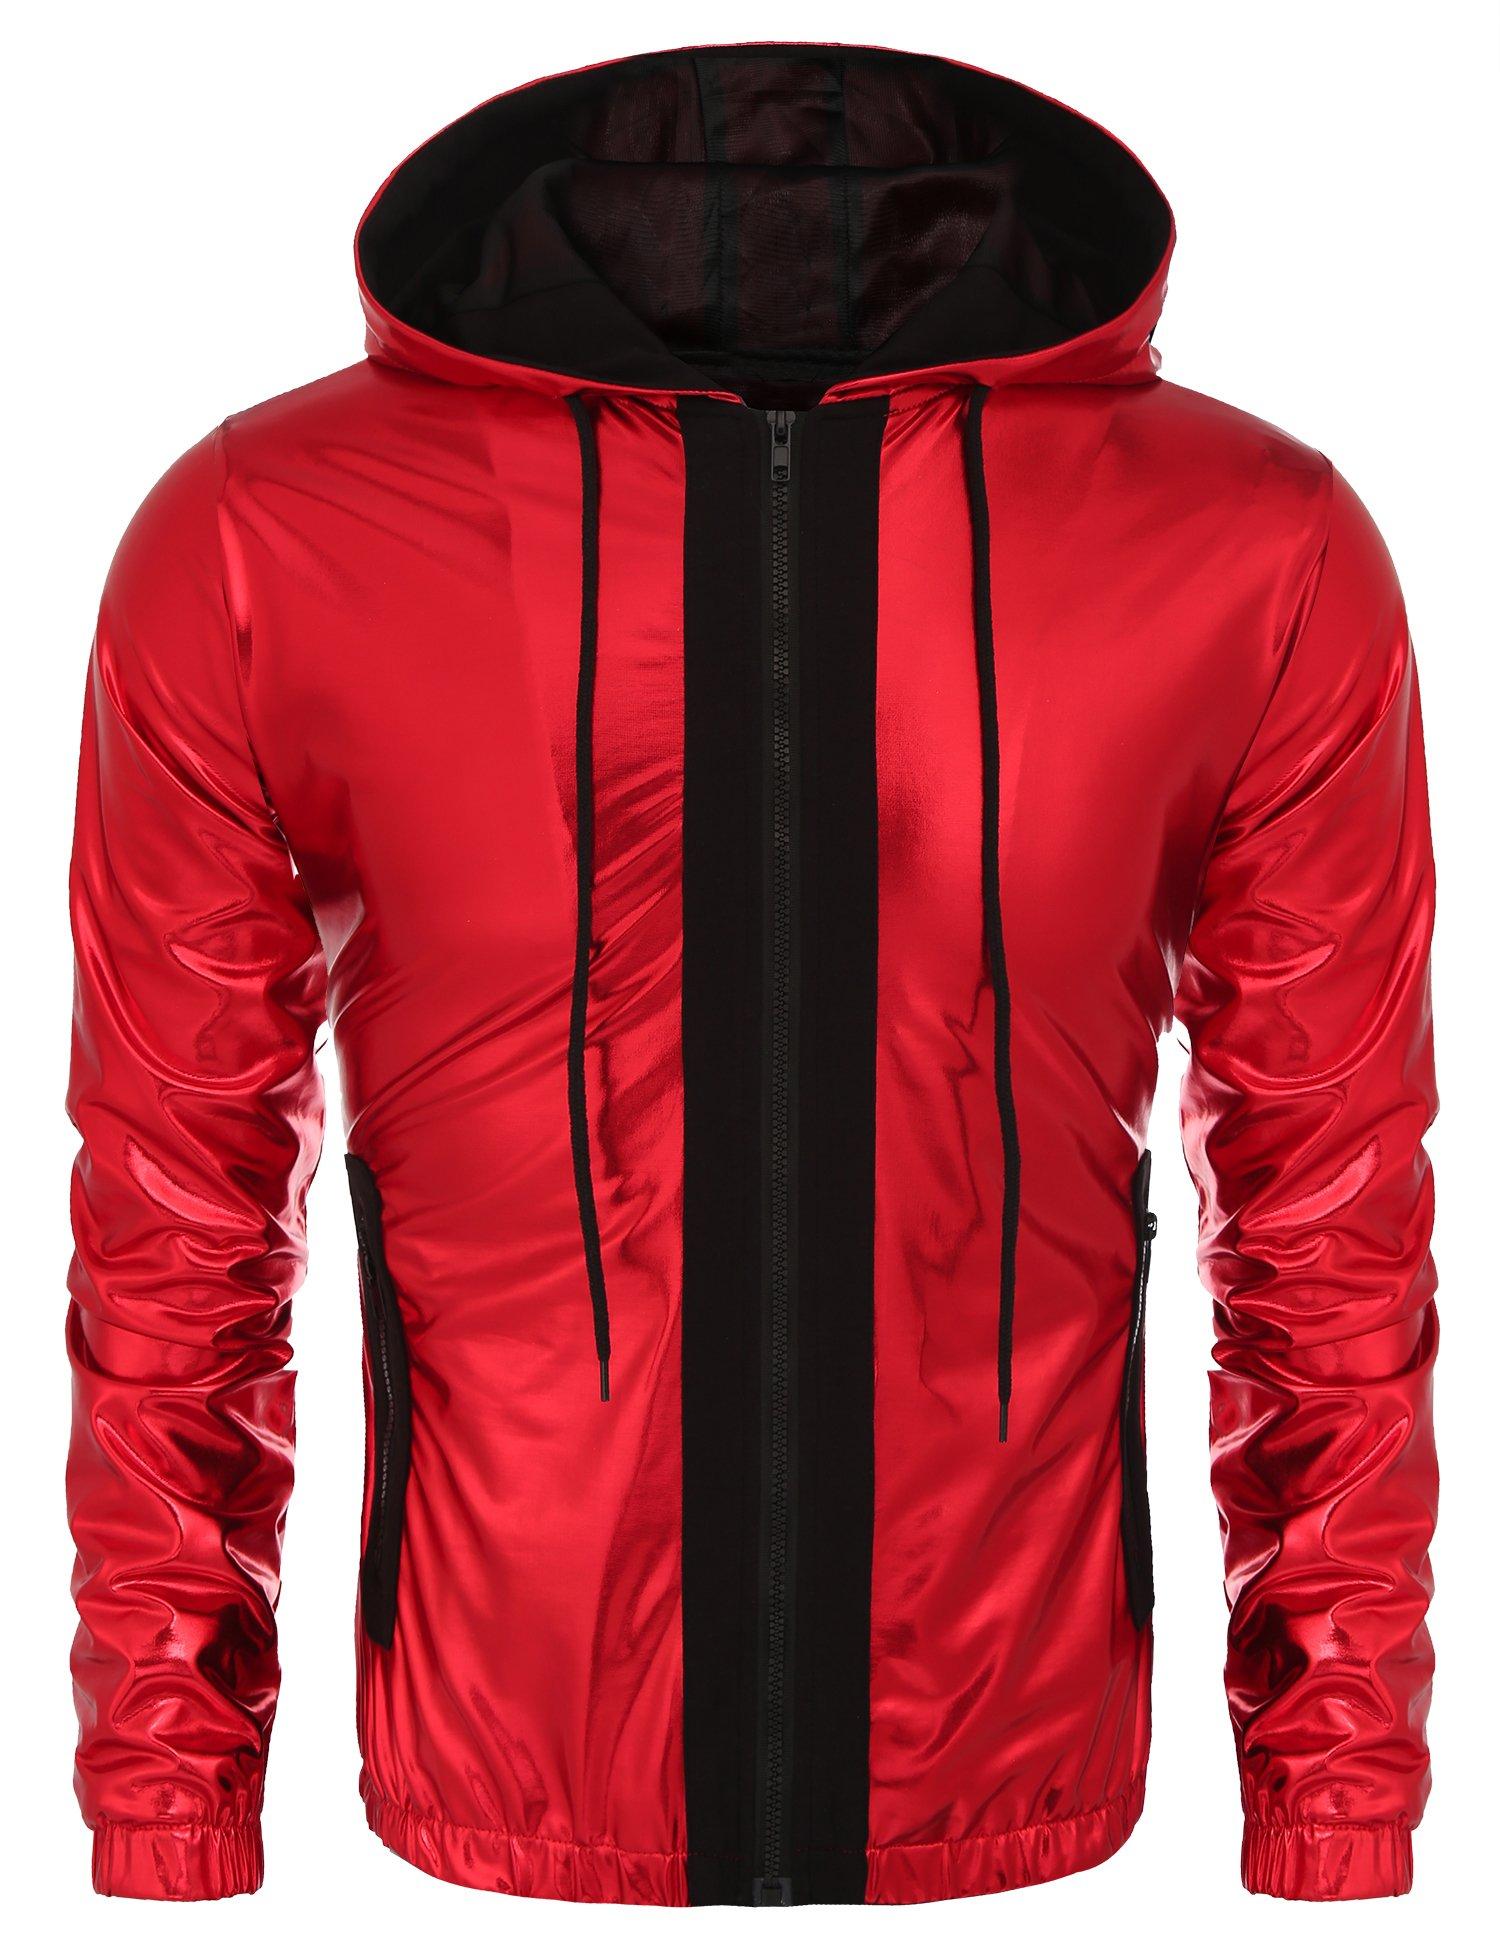 COOFANDY Mens Metallic Nightclub Style Hooded Varsity Baseball Bomber Jacket(L,Red)